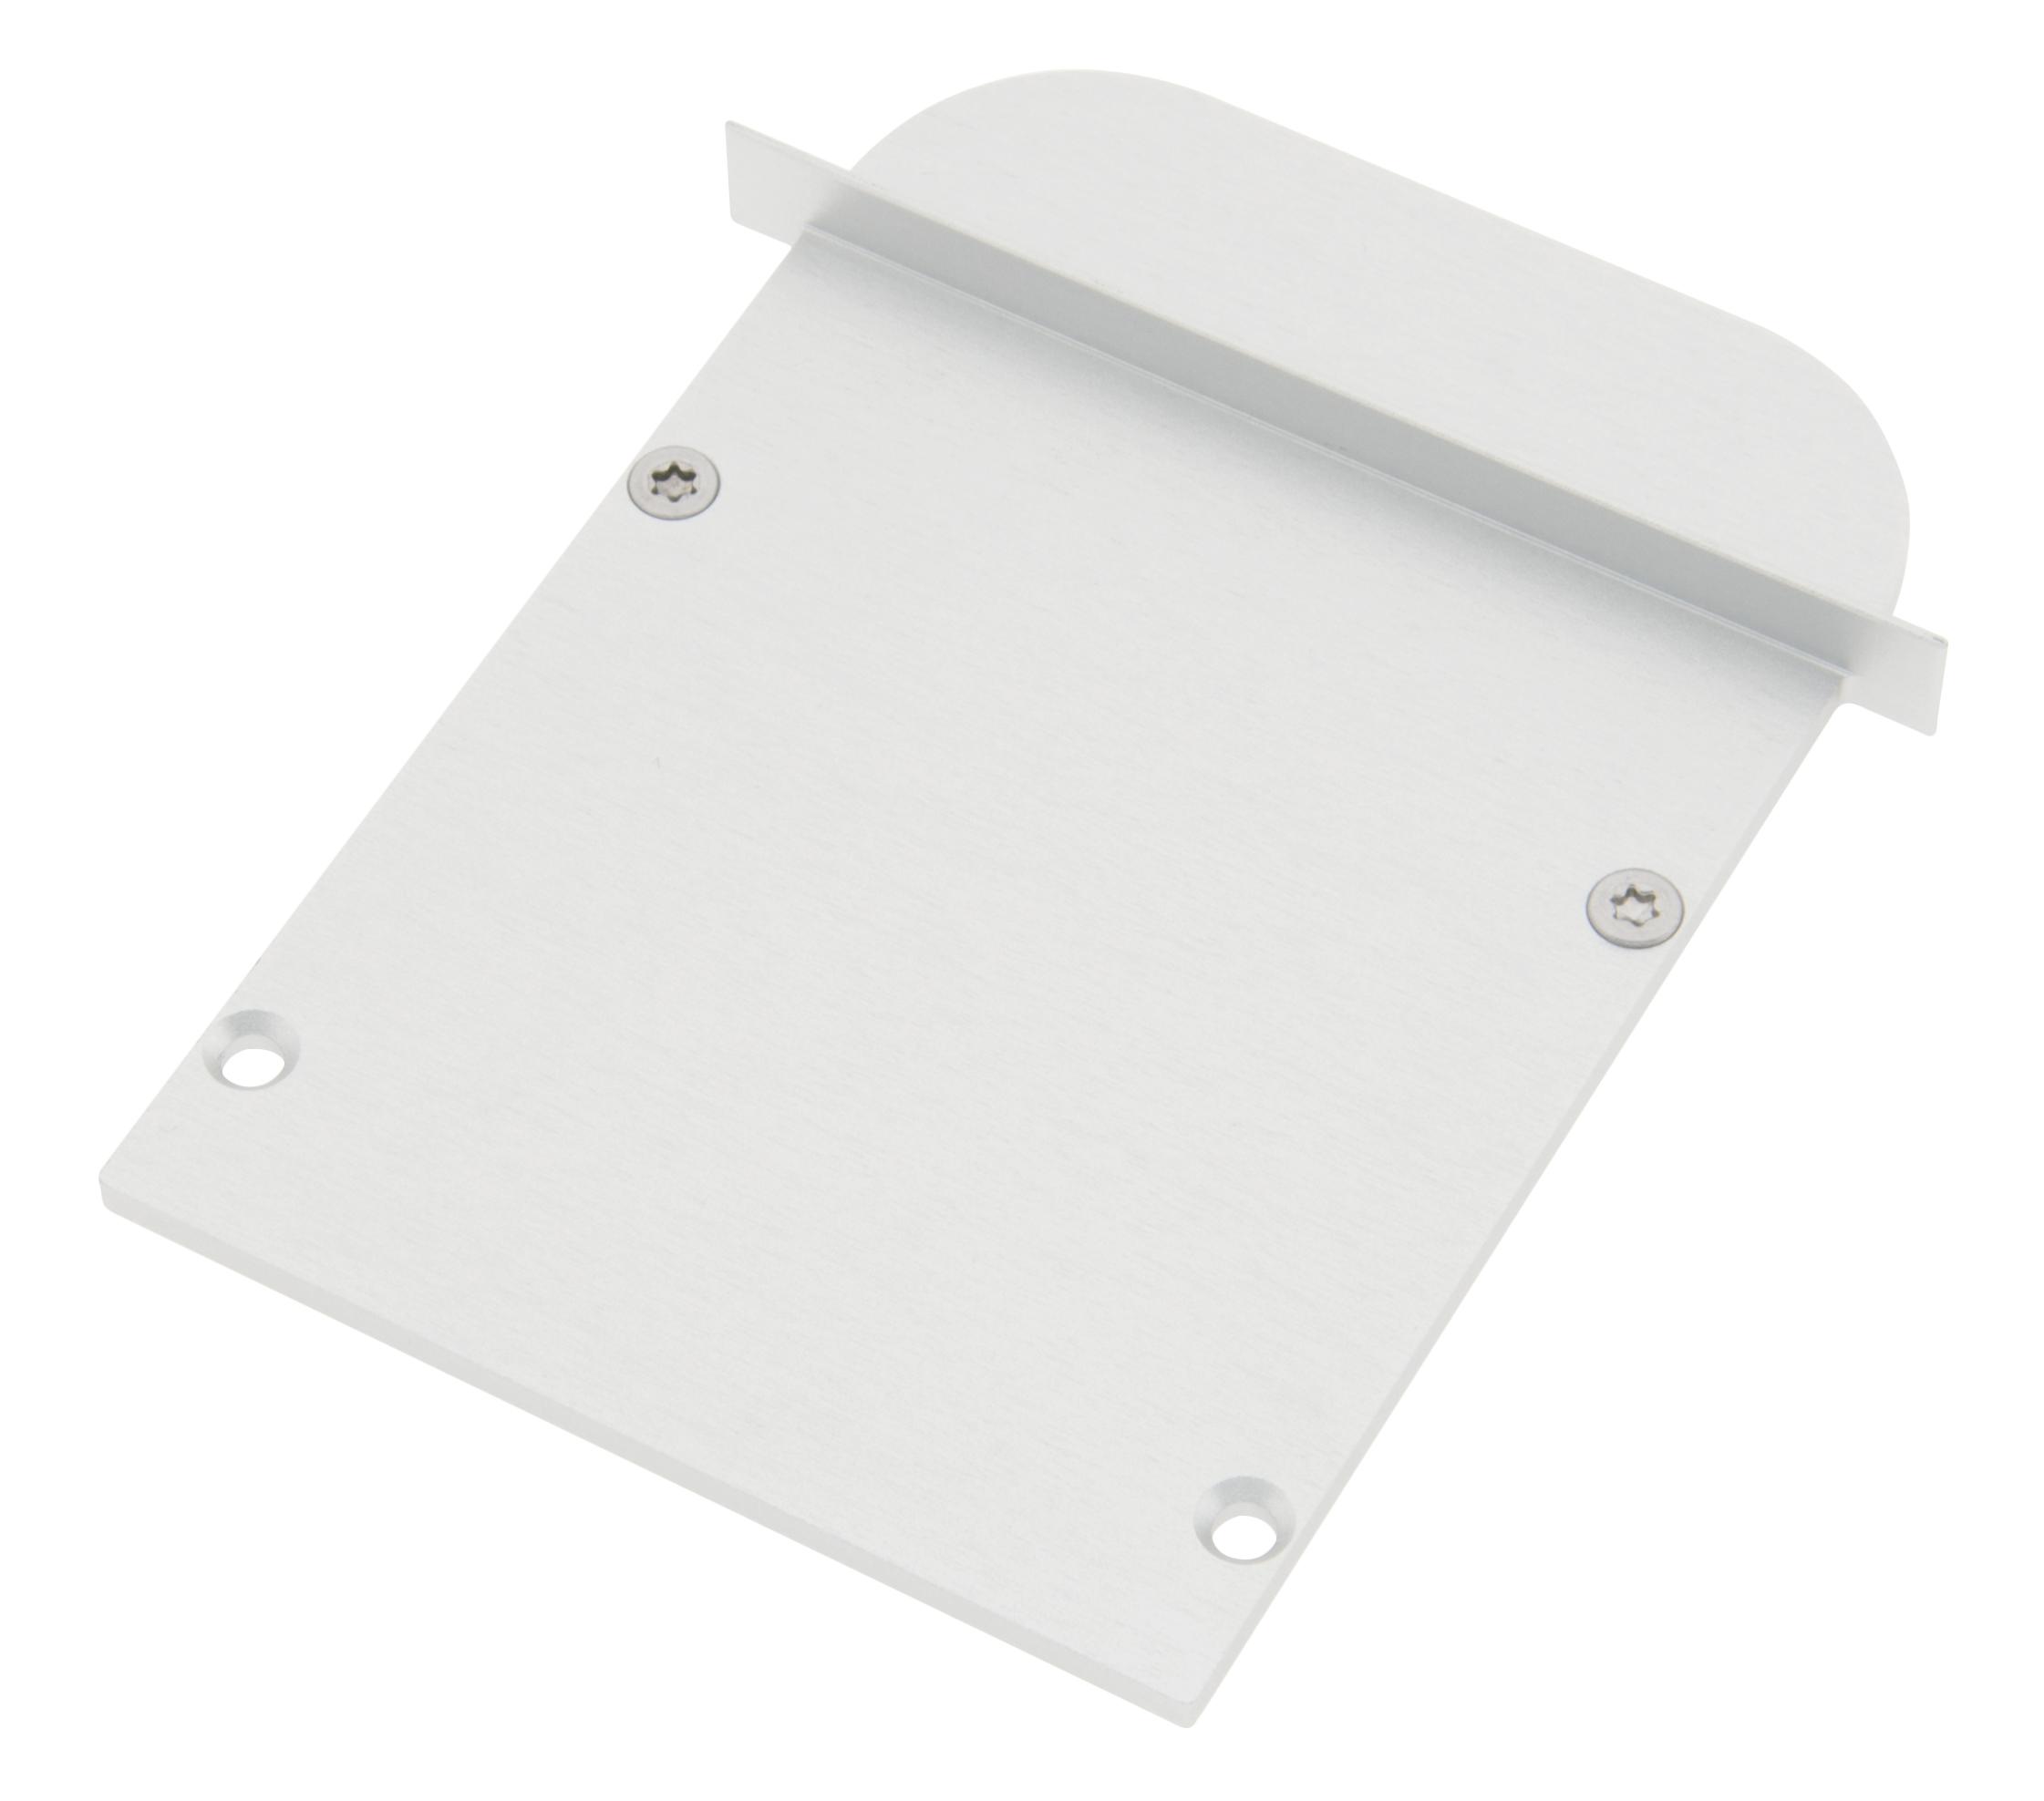 1 Stk Profil Endkappe SLT Rund geschlossen inkl. Schrauben LIEK003510